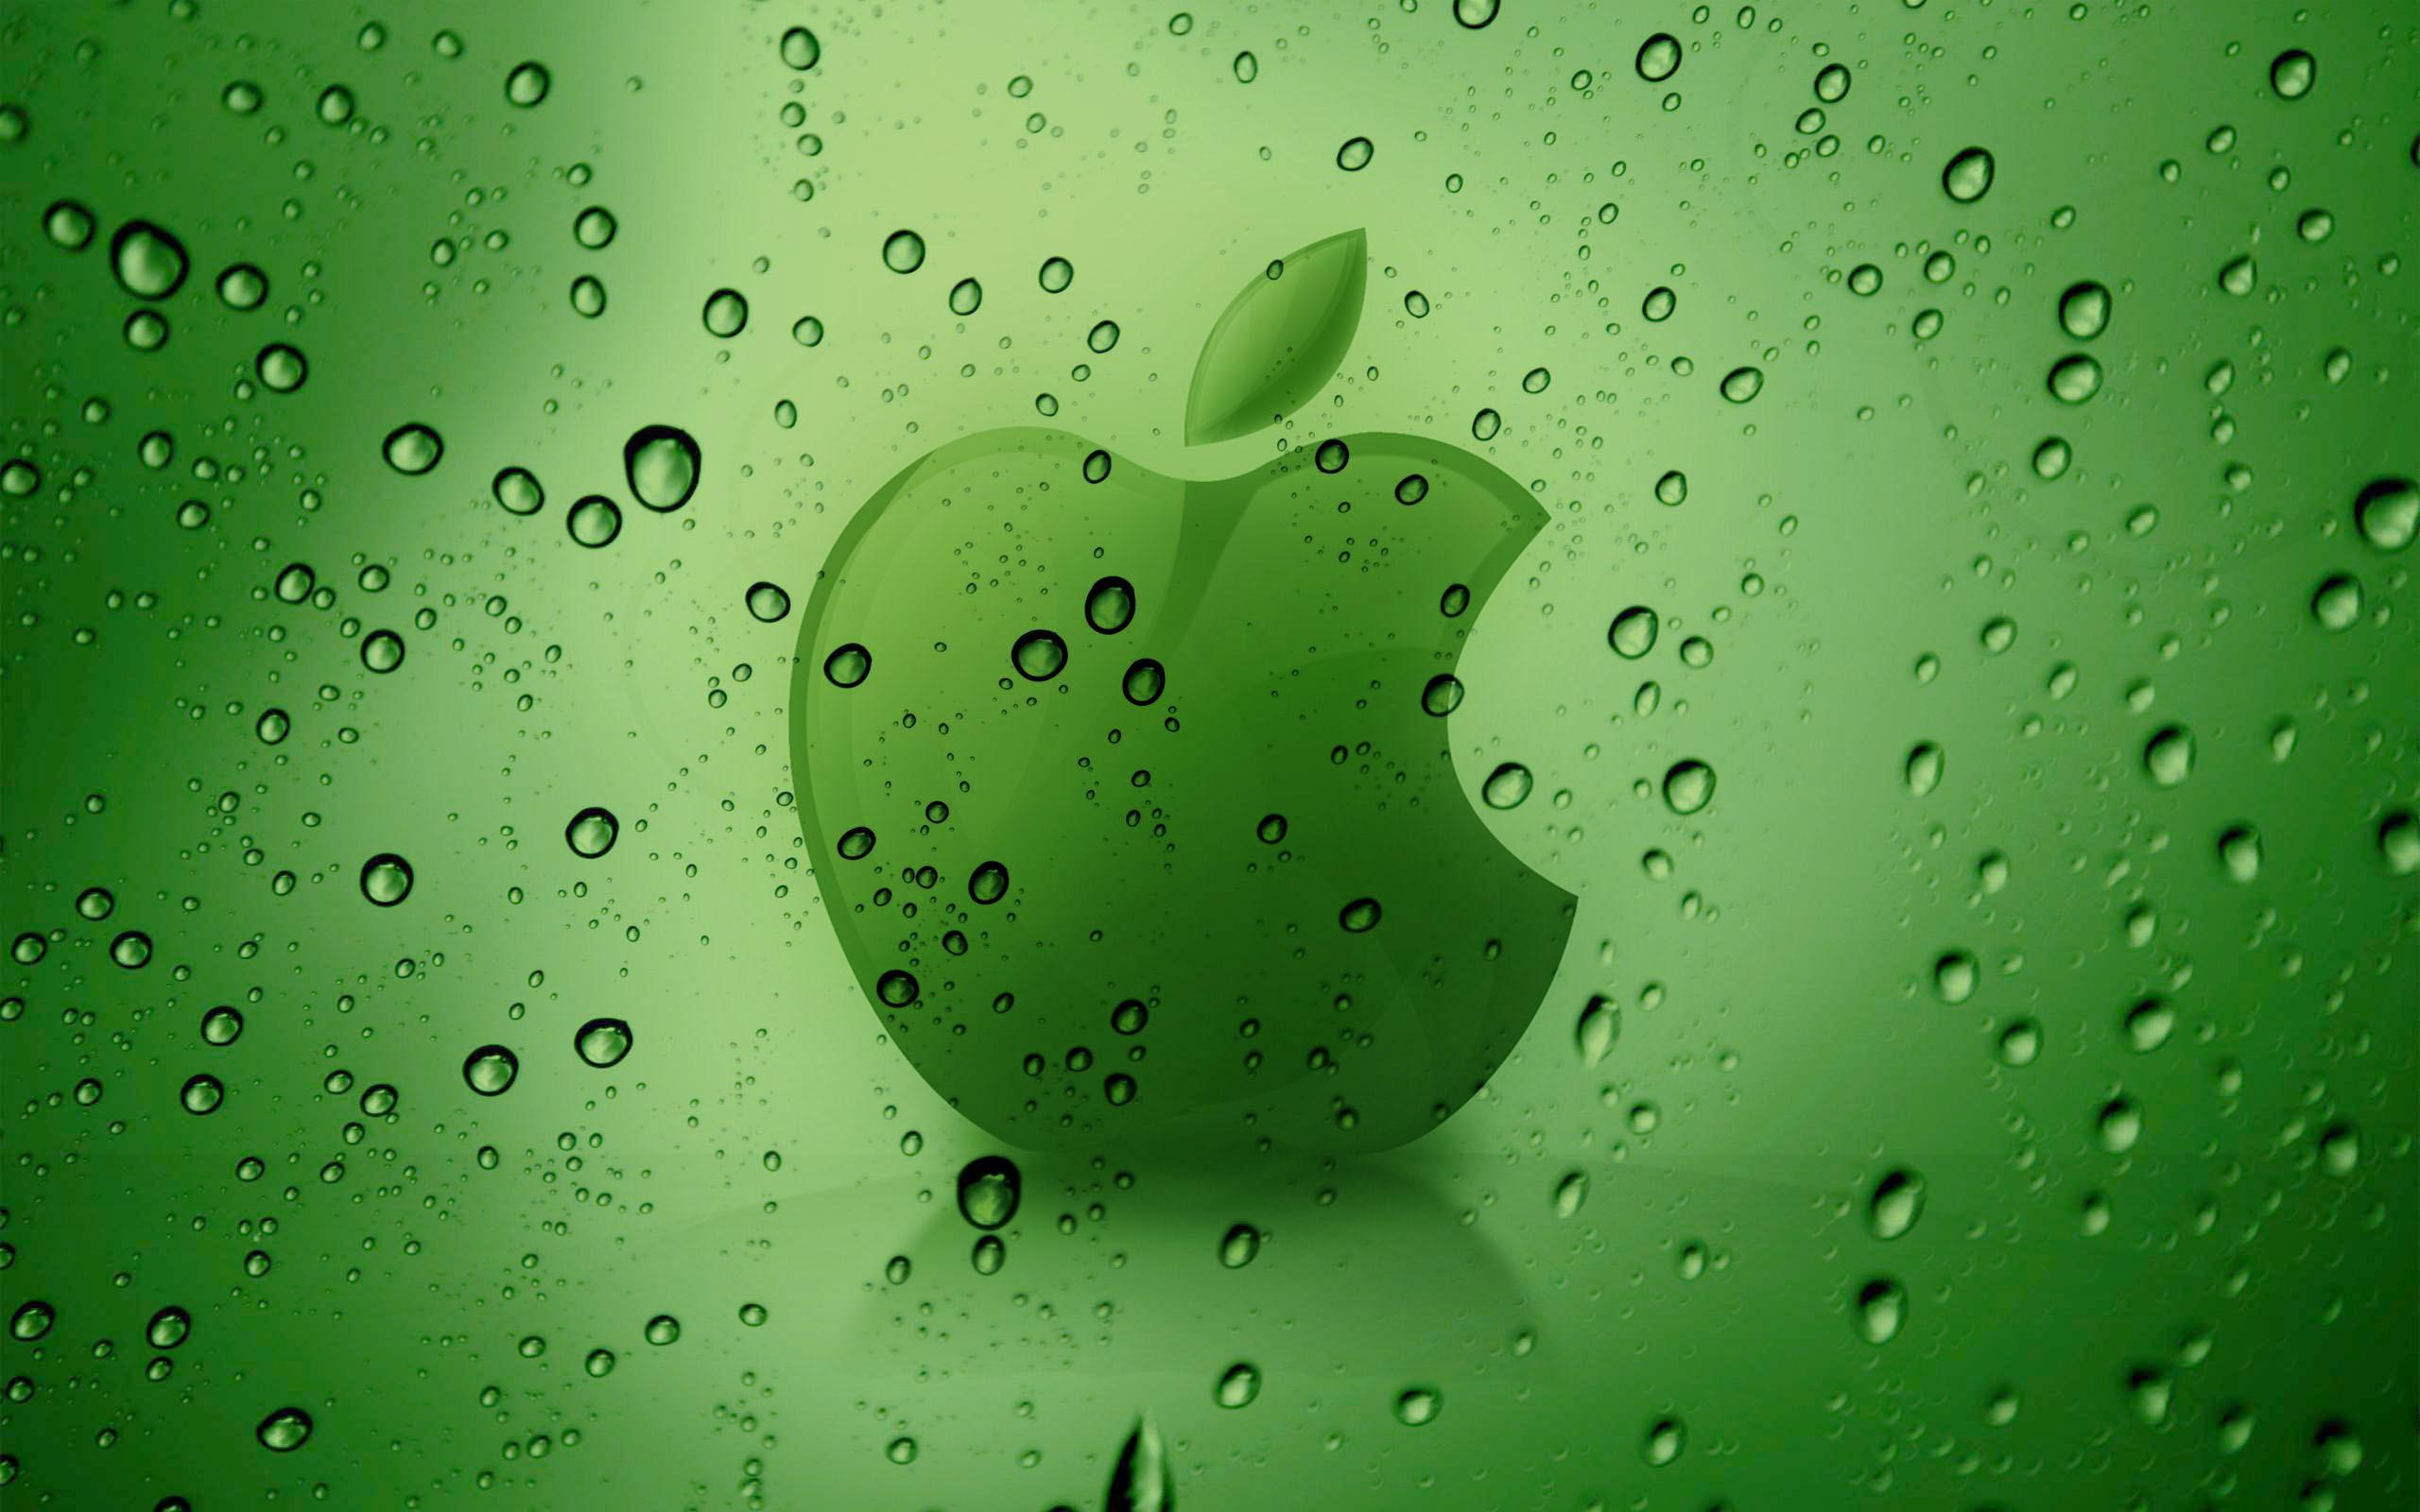 apple desktop pictures wallpaper High Quality WallpapersWallpaper 2560x1600